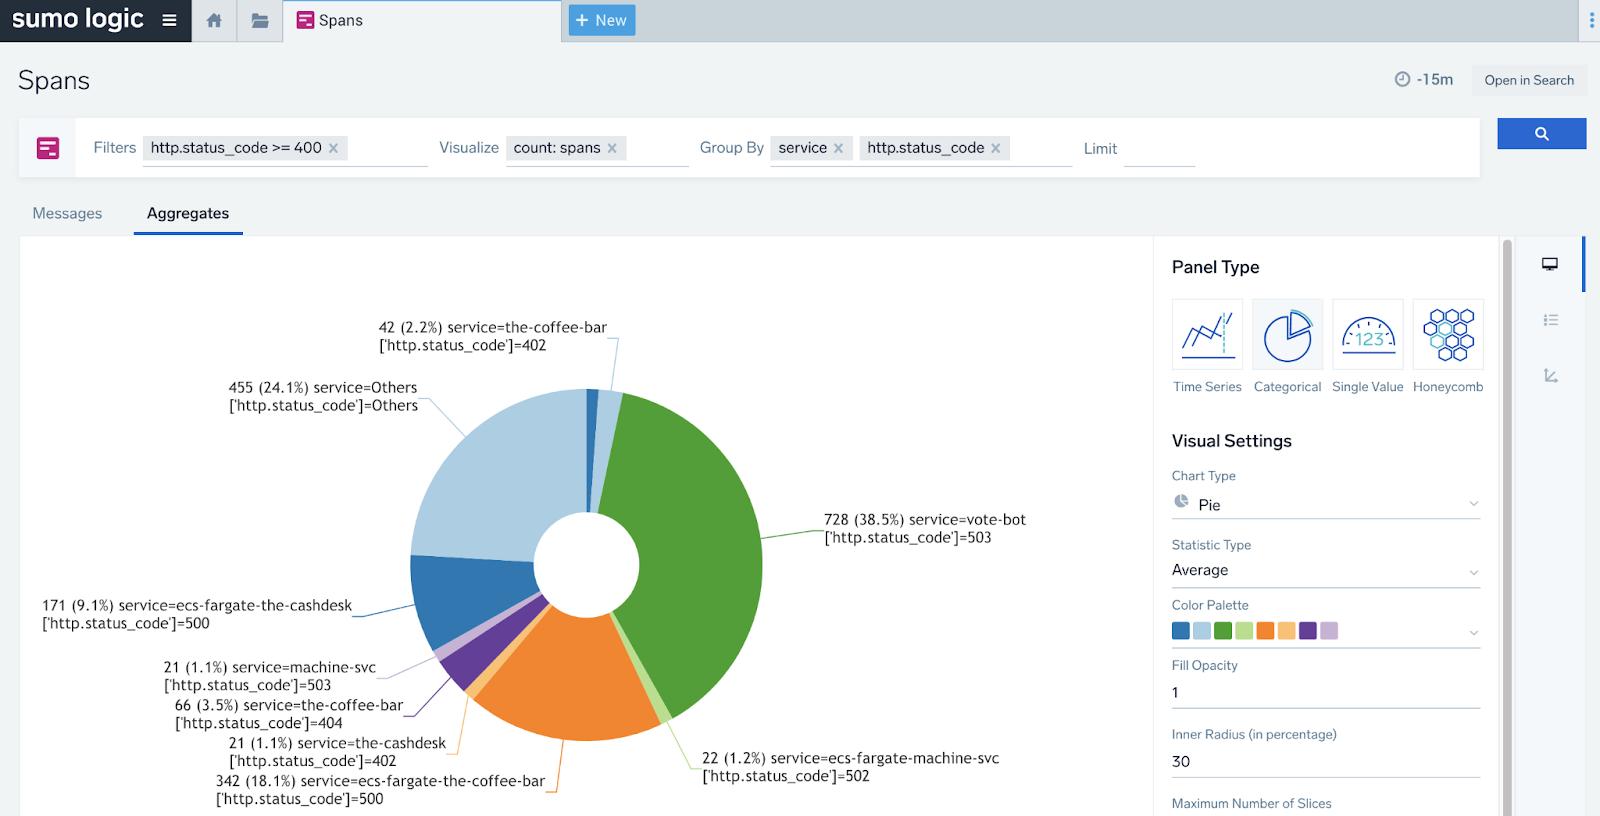 Sumo Logic Dashboard Spans Aggregates Visualize